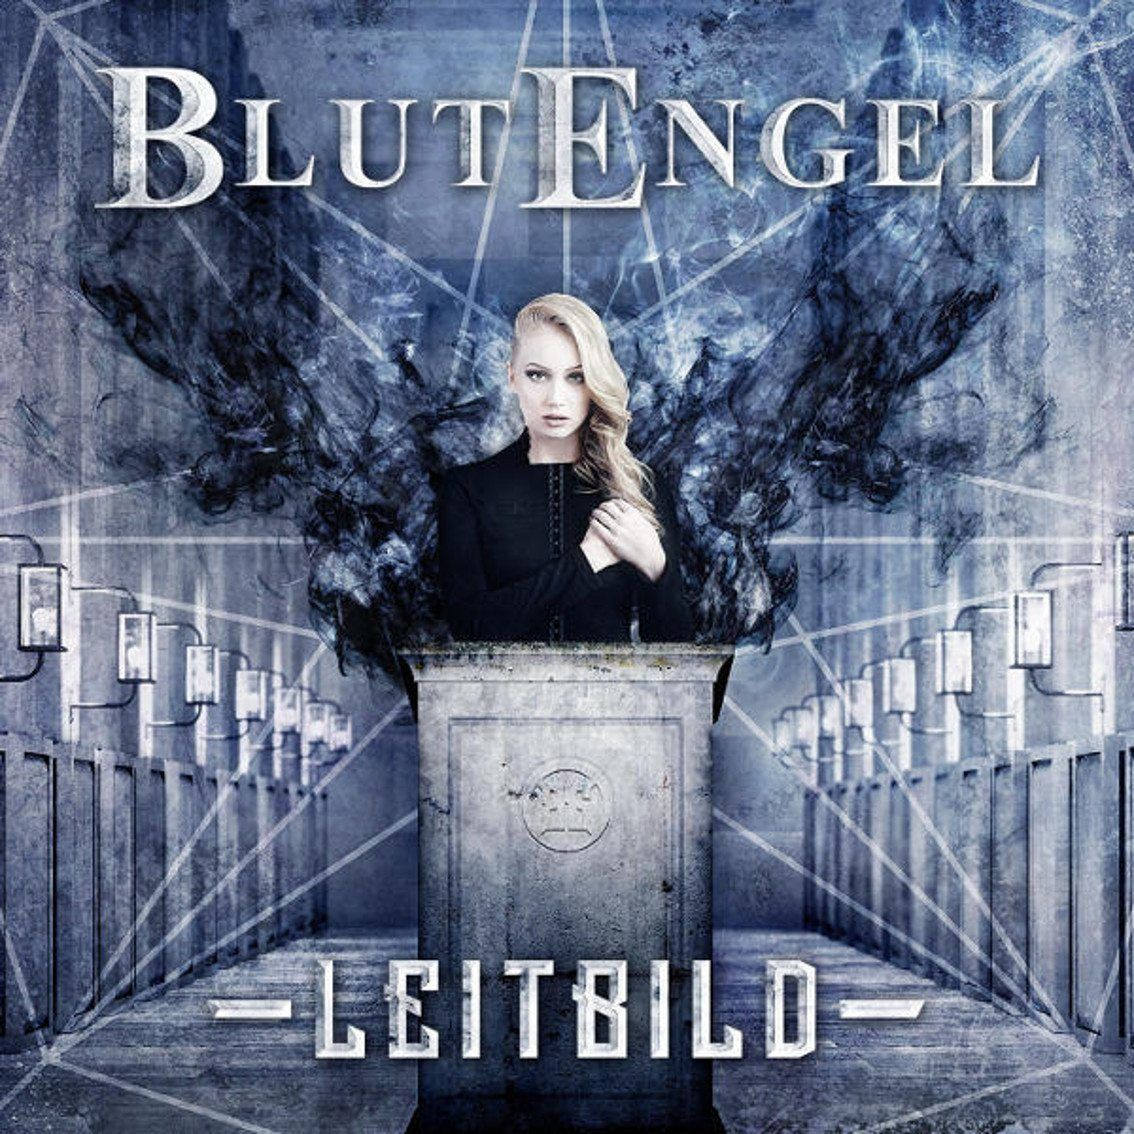 Full details new Blutengel album'Leitbild' released - boxset, vinyl, ...